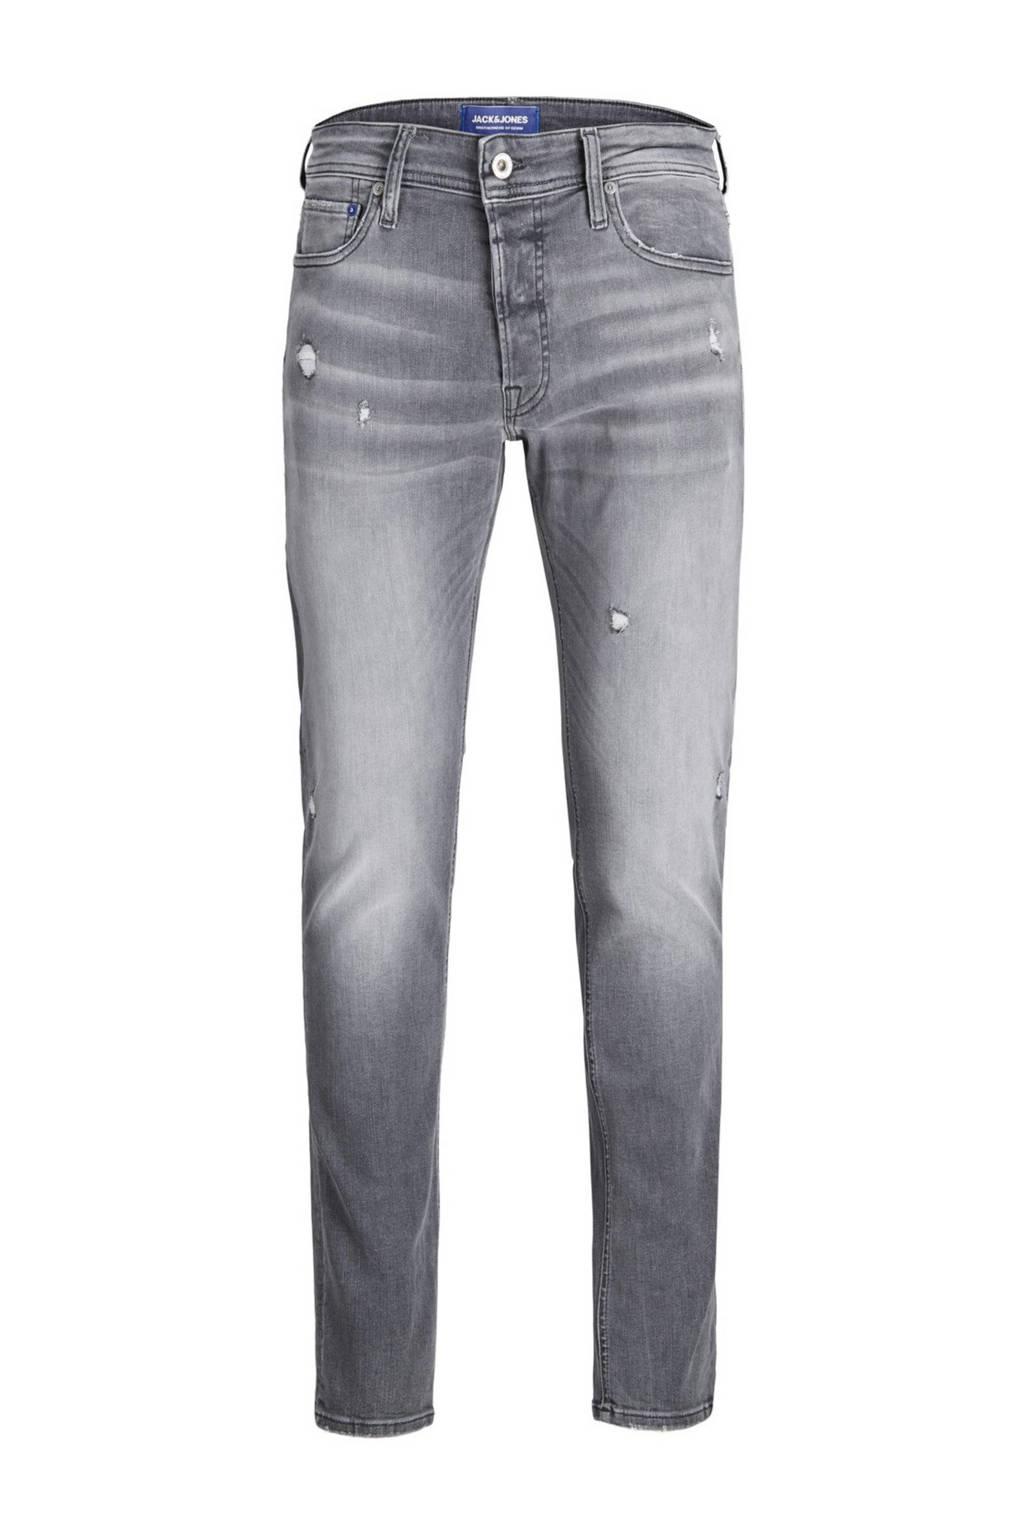 JACK & JONES JEANS INTELLIGENCE slim fit jeans grey denim, Grey denim